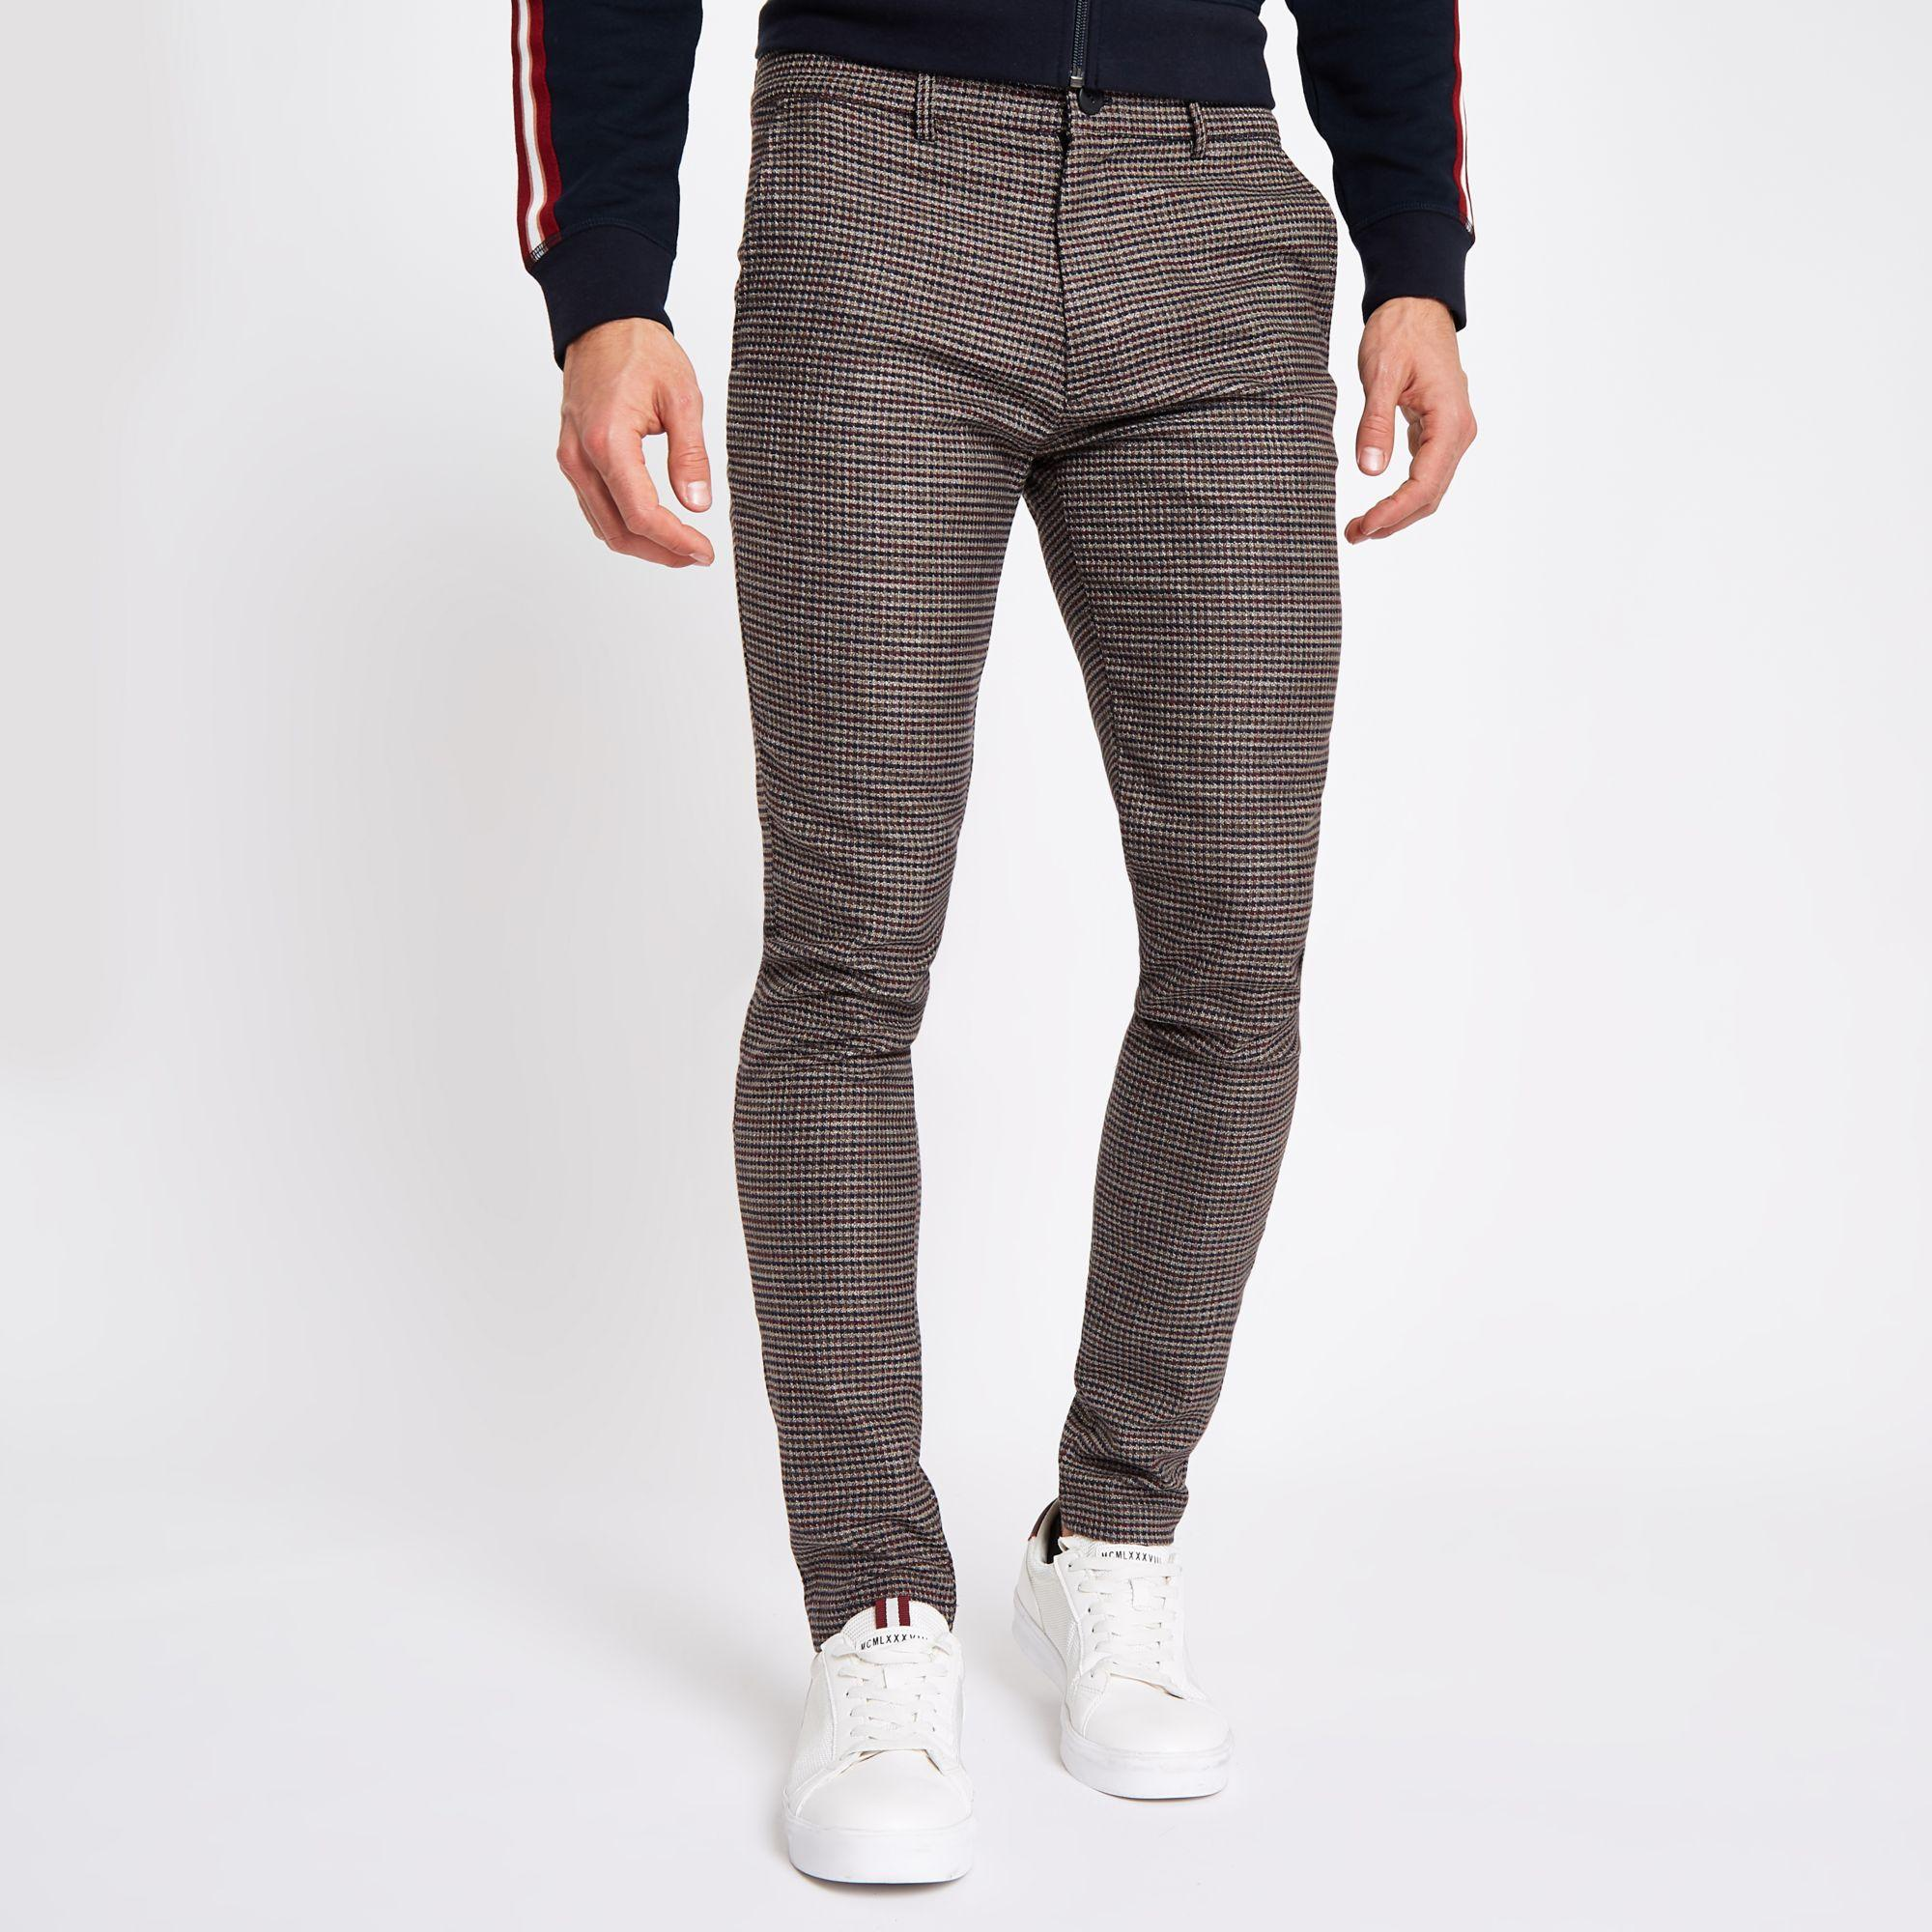 6187a8e89da3 River Island Houndstooth Stretch Super Skinny Pants in Brown for Men ...